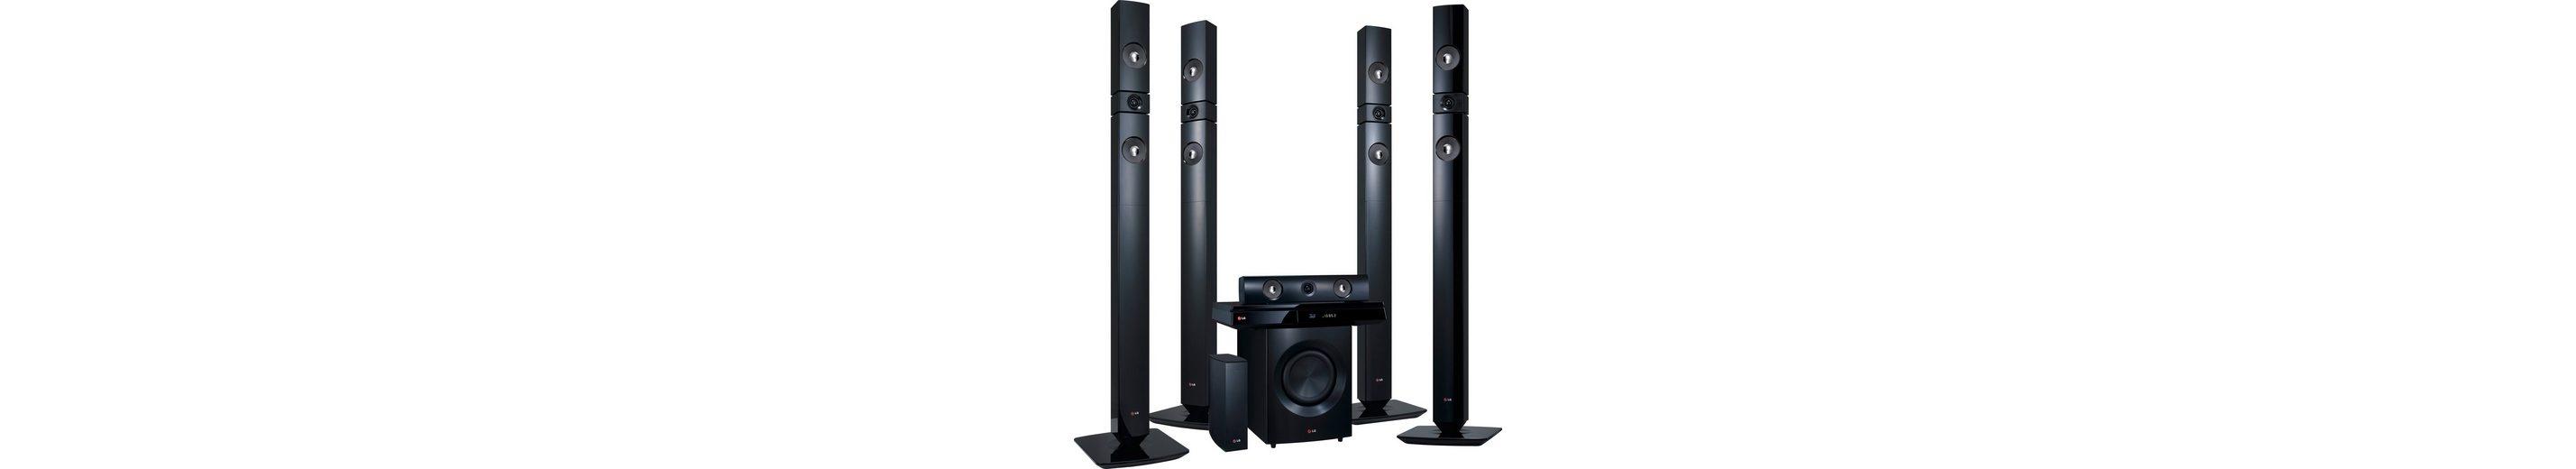 LG BH7530TWB 5.1 Heimkinosystem (3D Blu-ray Player, 1.200 W, WLAN, Bluetooth, Spotify)